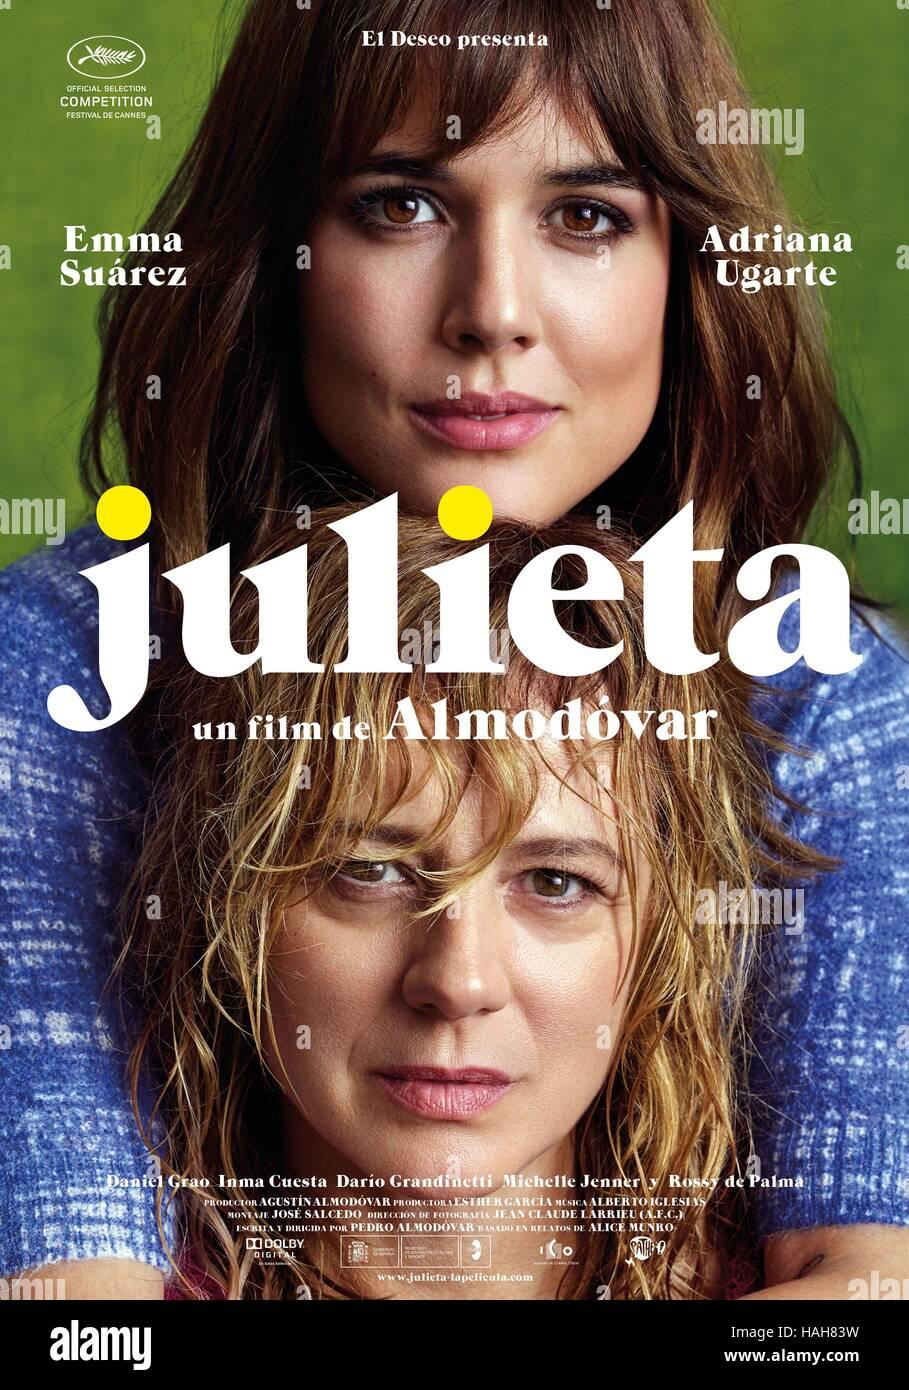 poster pelicula julieta